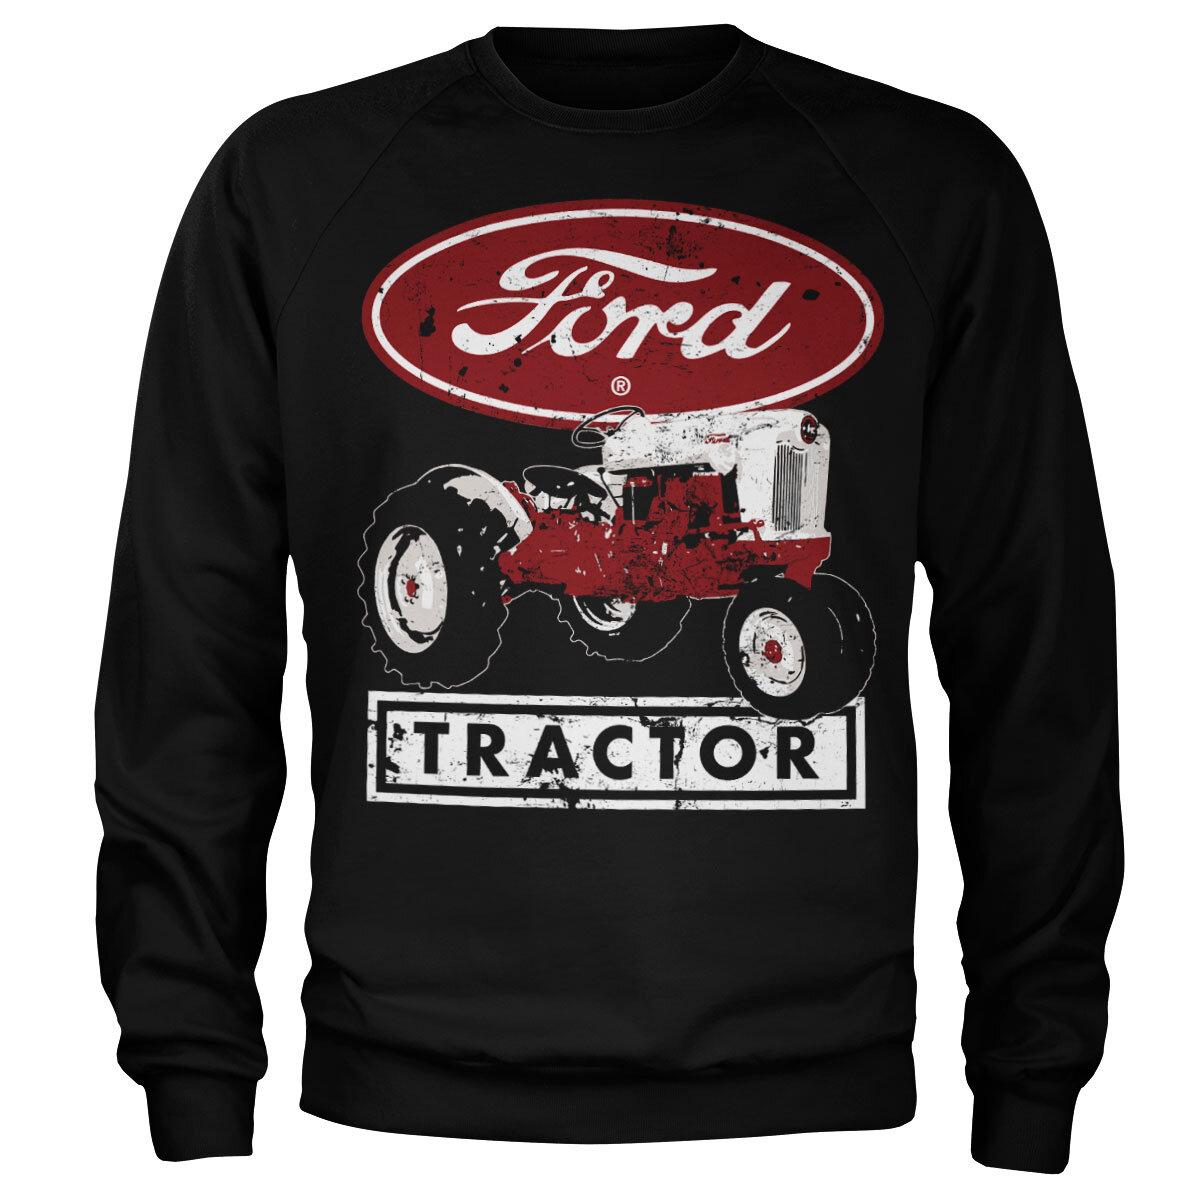 Ford Tractor Sweatshirt